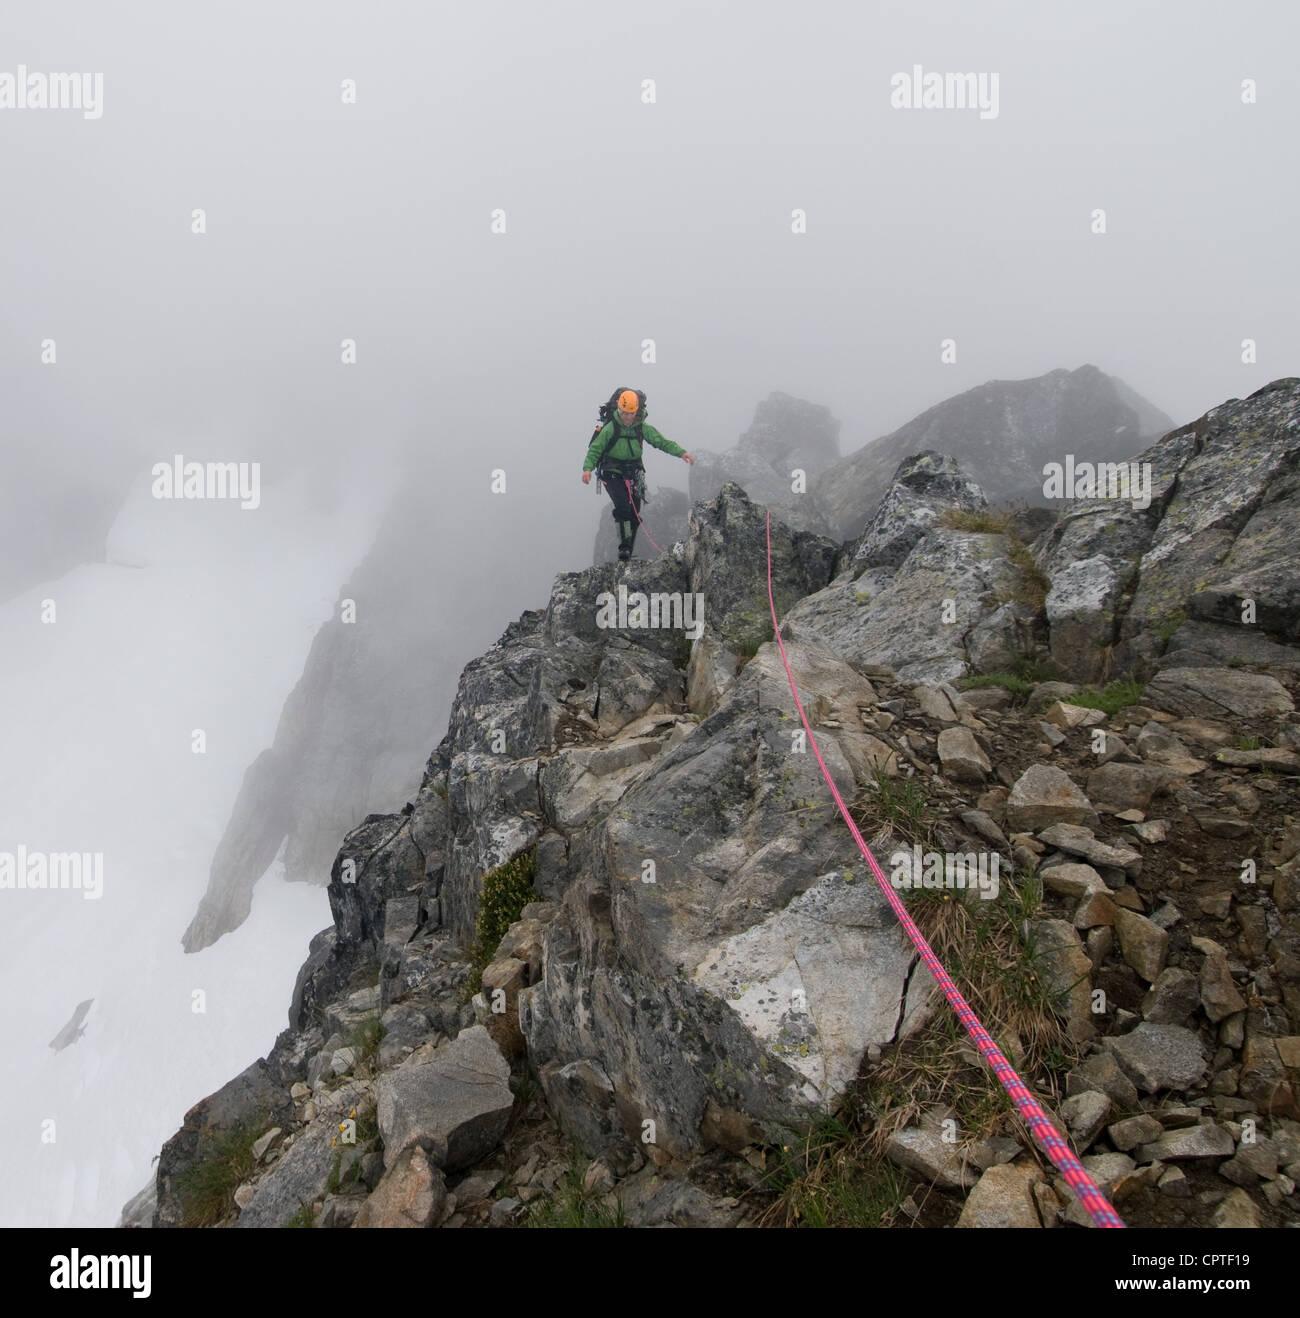 Female climber crossing rock ridge, Picket Pass, North Cascades National Park, WA, USA - Stock Image